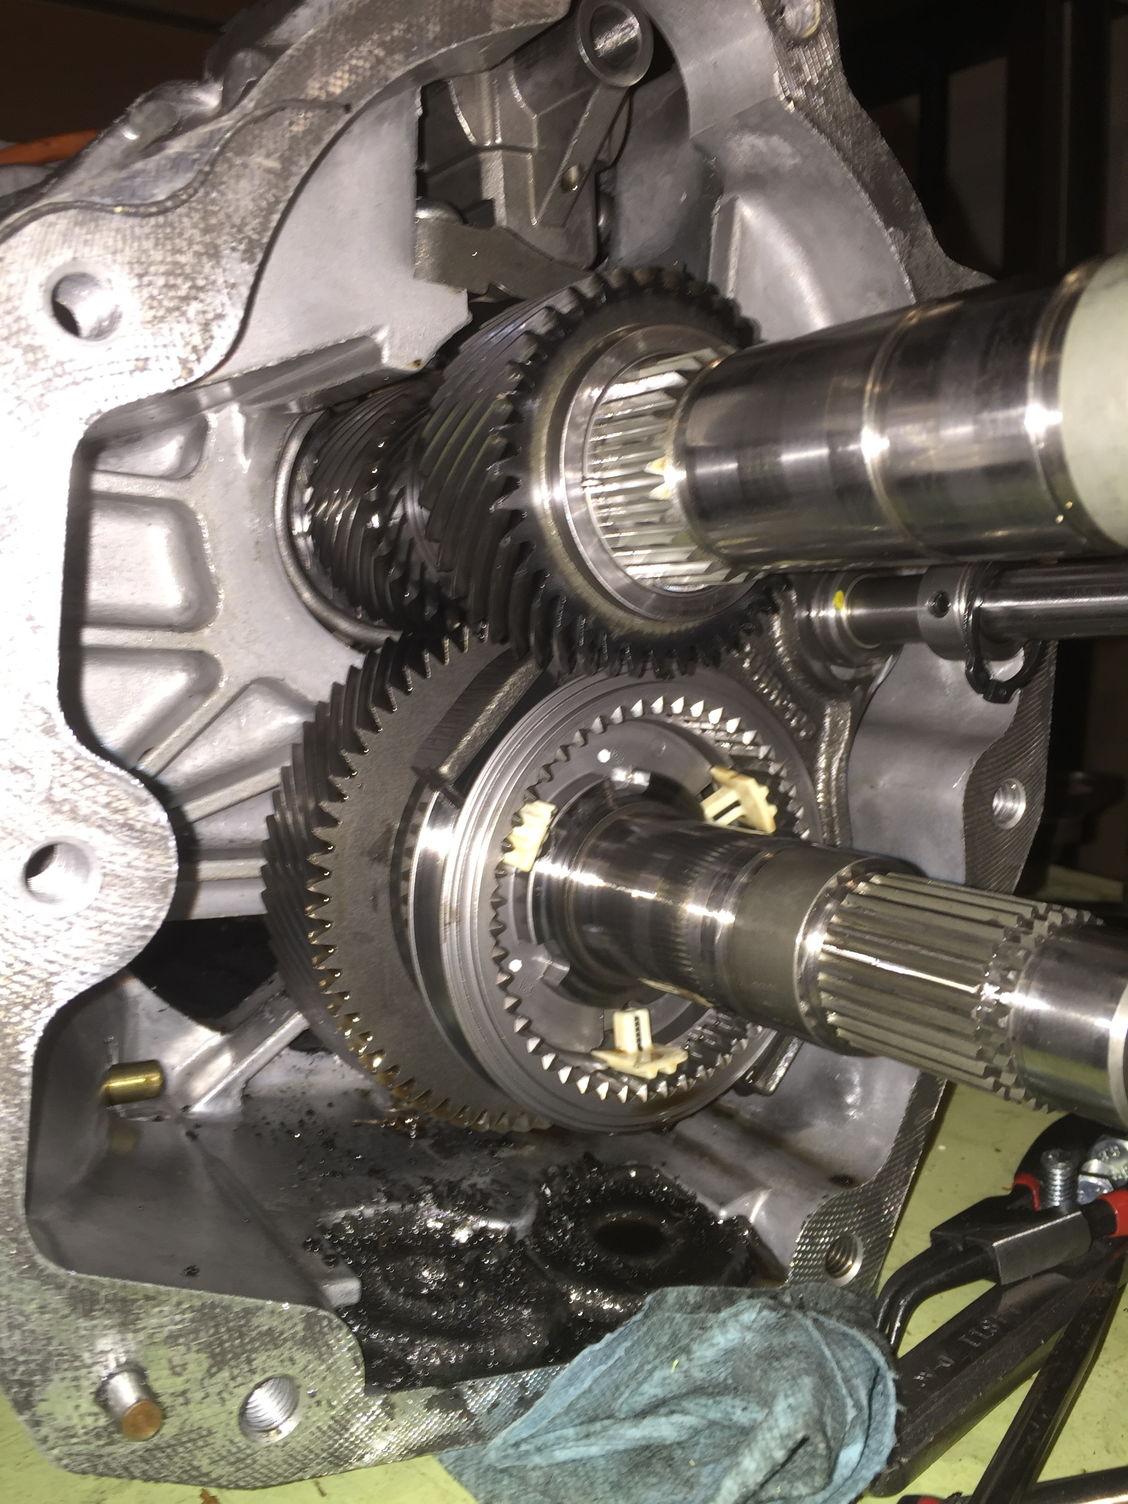 What Does Camaro Mean >> TR6060 Rebuild. Problems. - Camaro5 Chevy Camaro Forum / Camaro ZL1, SS and V6 Forums - Camaro5.com